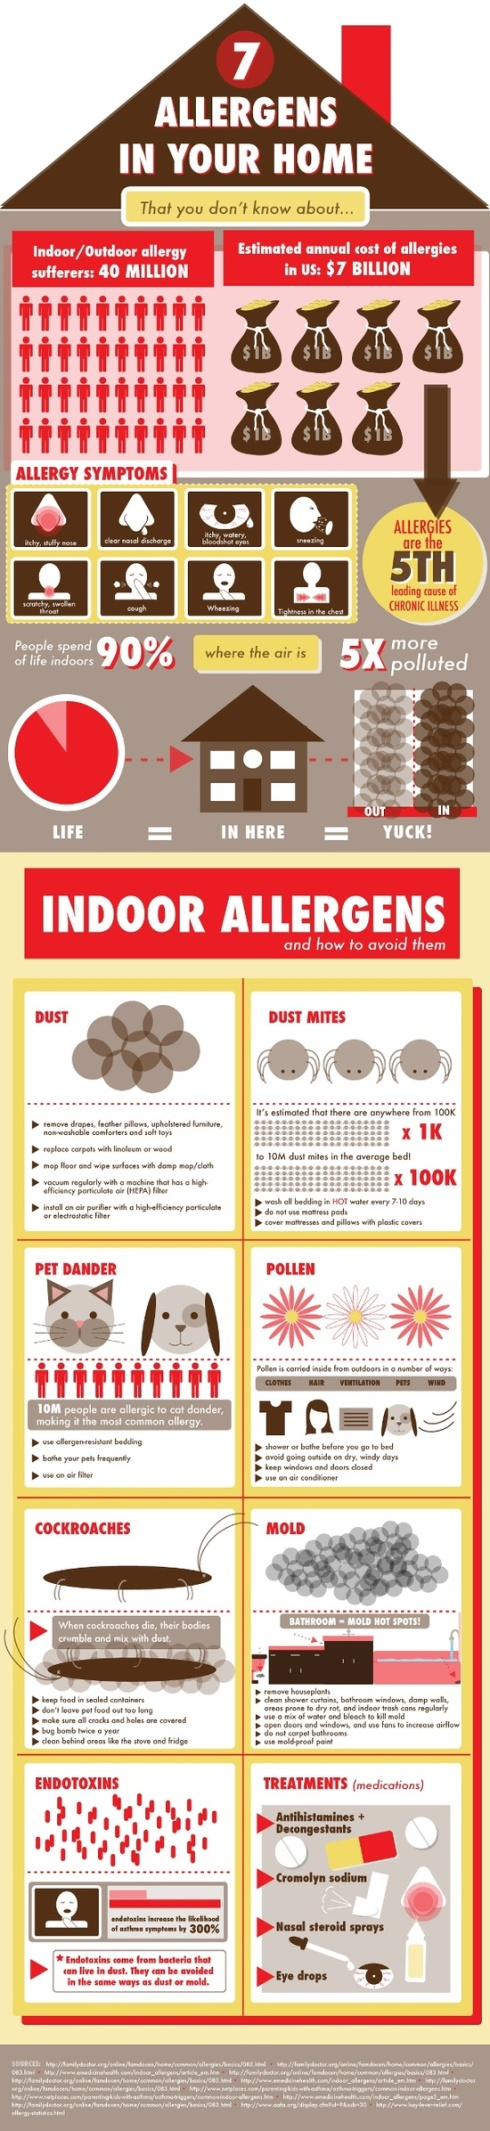 allergenInfographic